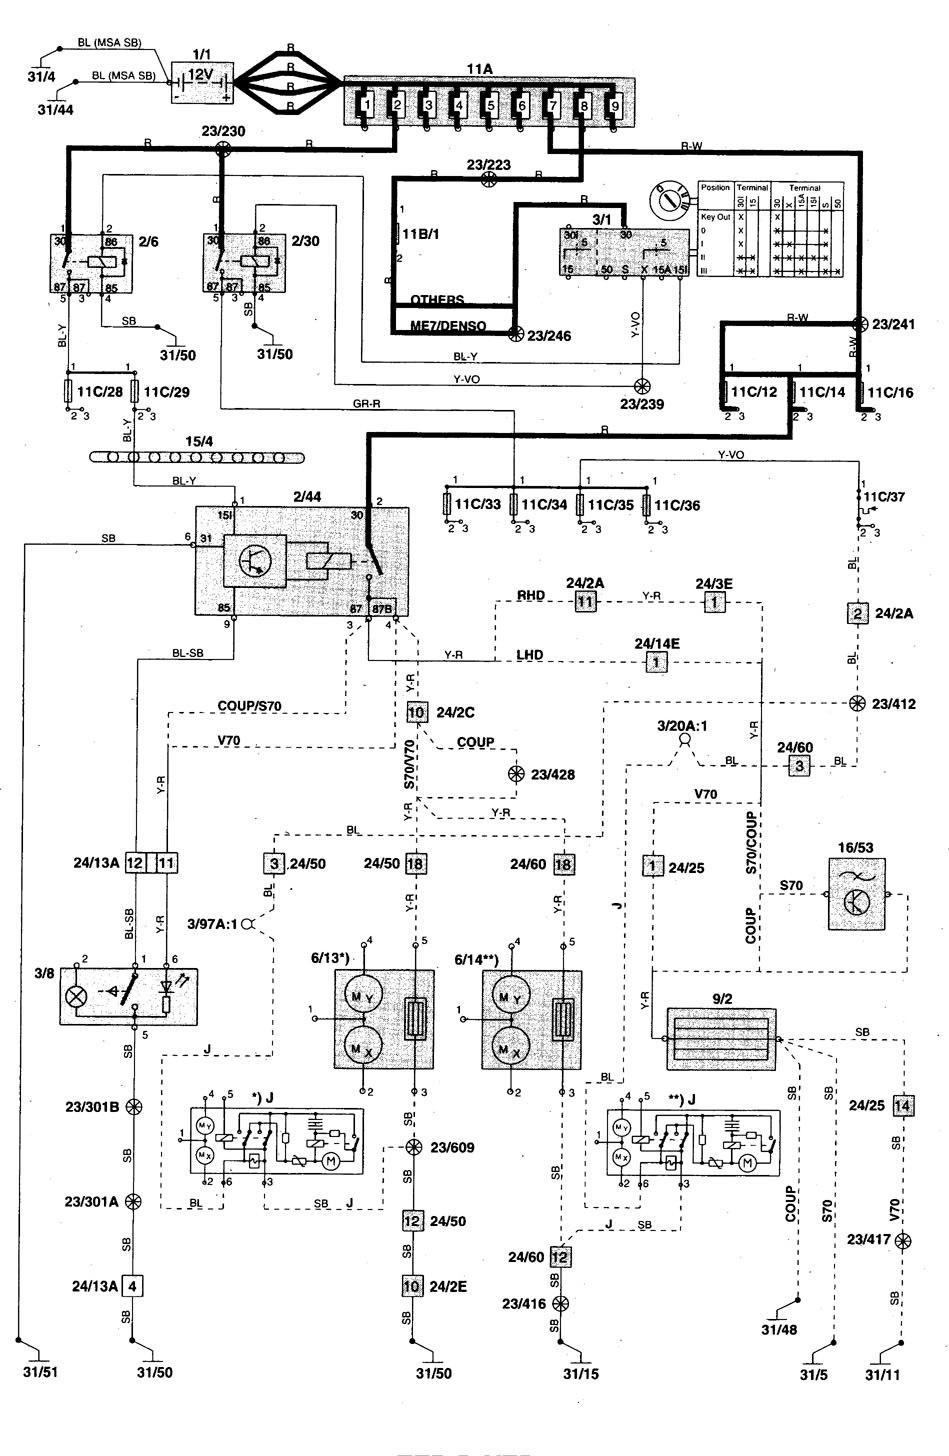 Comfortable Ski Doo Wiring Diagrams Contemporary - Wiring Schematics ...